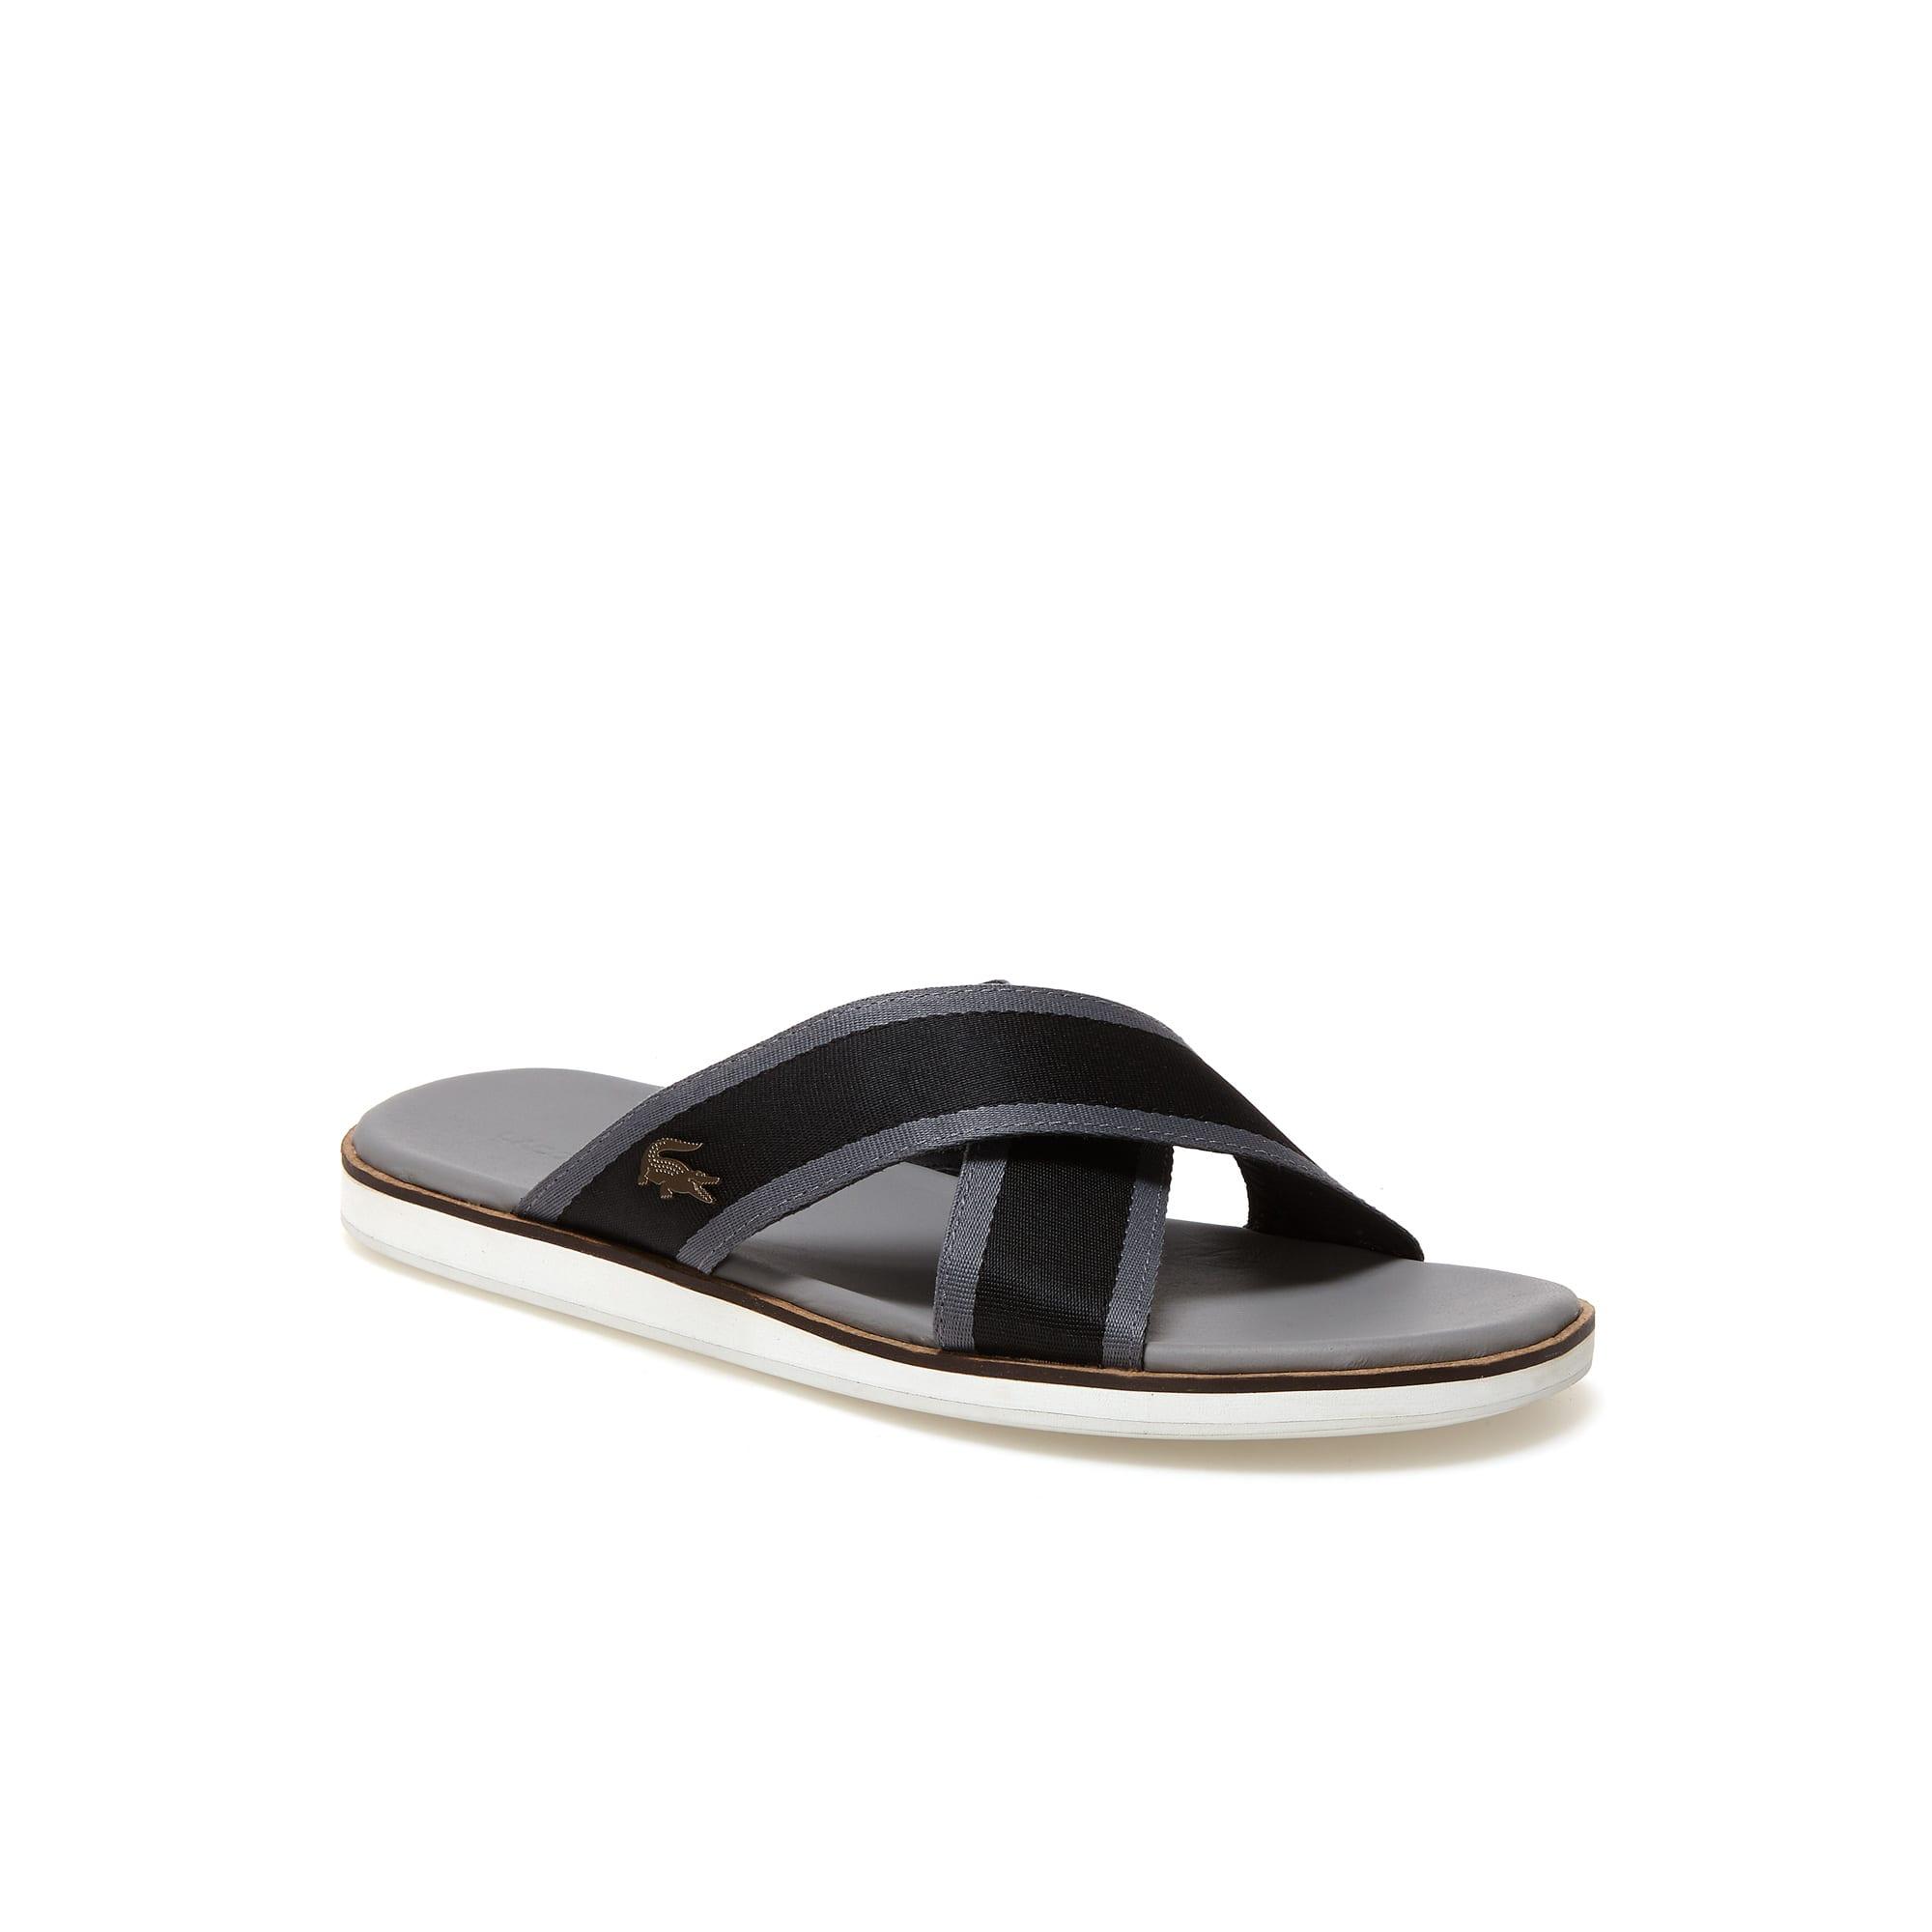 Men's Coupri Leather Slip-ons